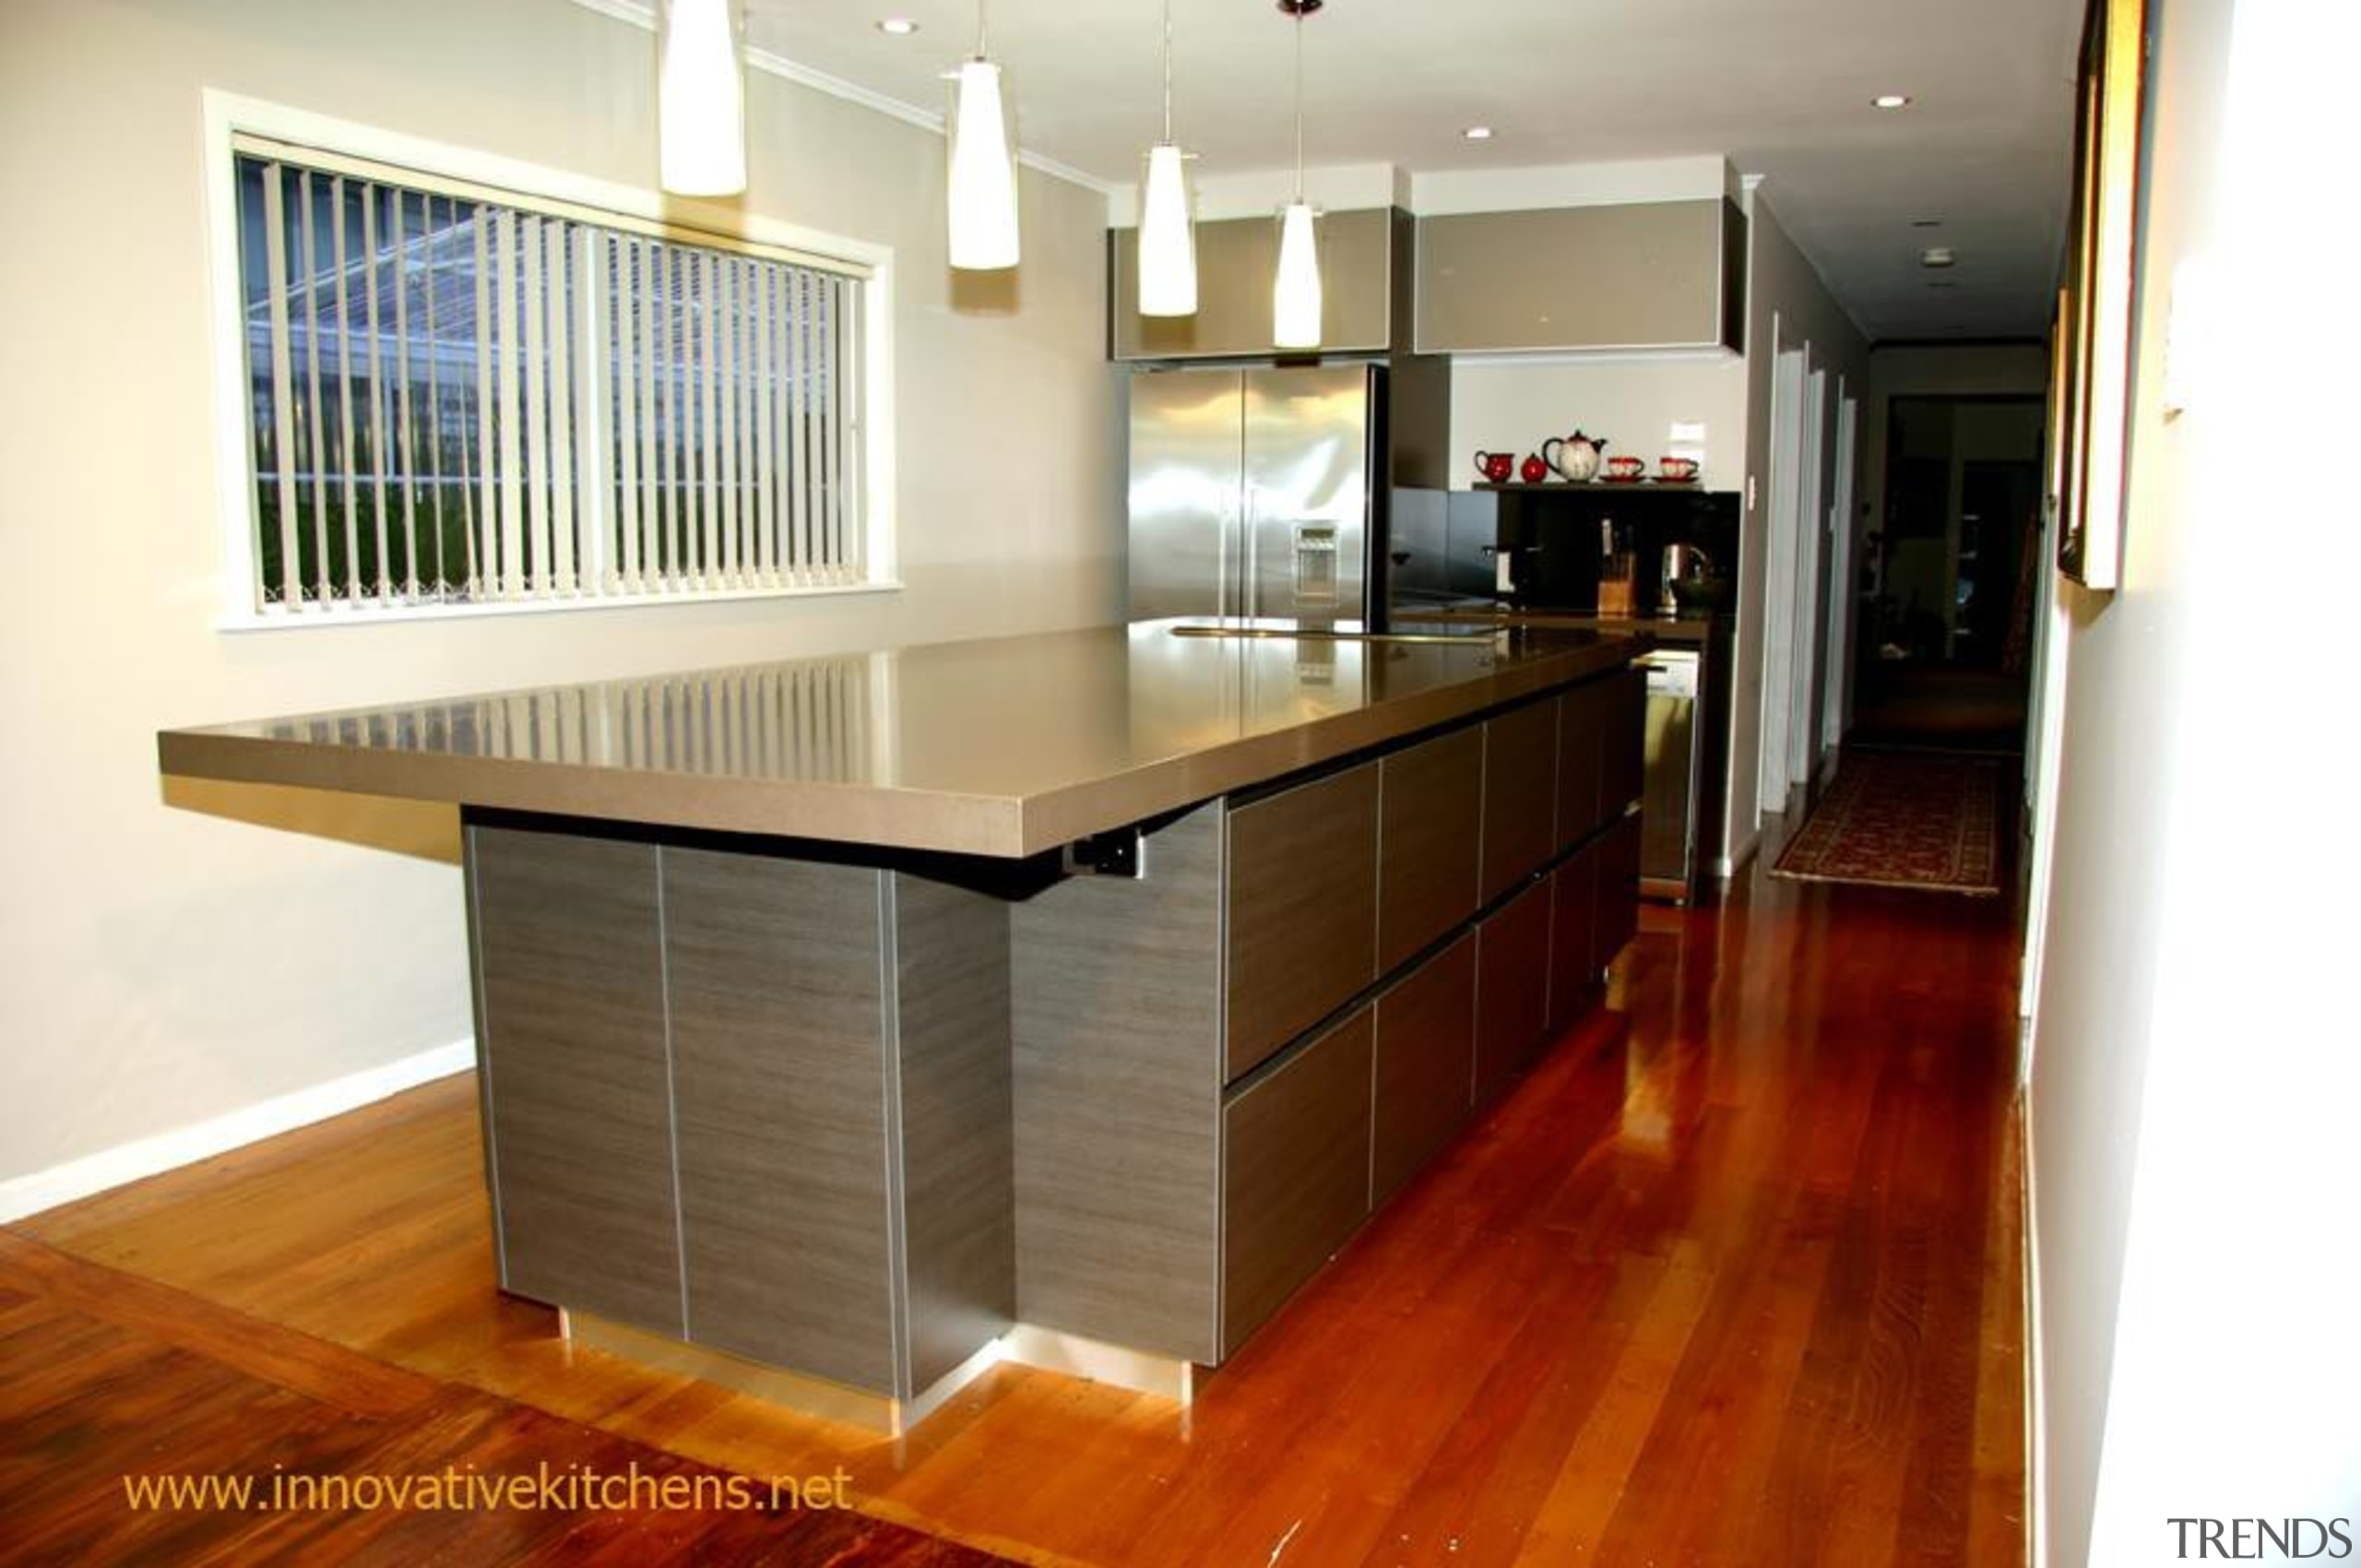 19 modern lynfield 2012 1.jpg - 19_modern_lynfield_2012_1.jpg - cabinetry, countertop, floor, flooring, hardwood, interior design, kitchen, property, real estate, room, wood, wood flooring, white, brown